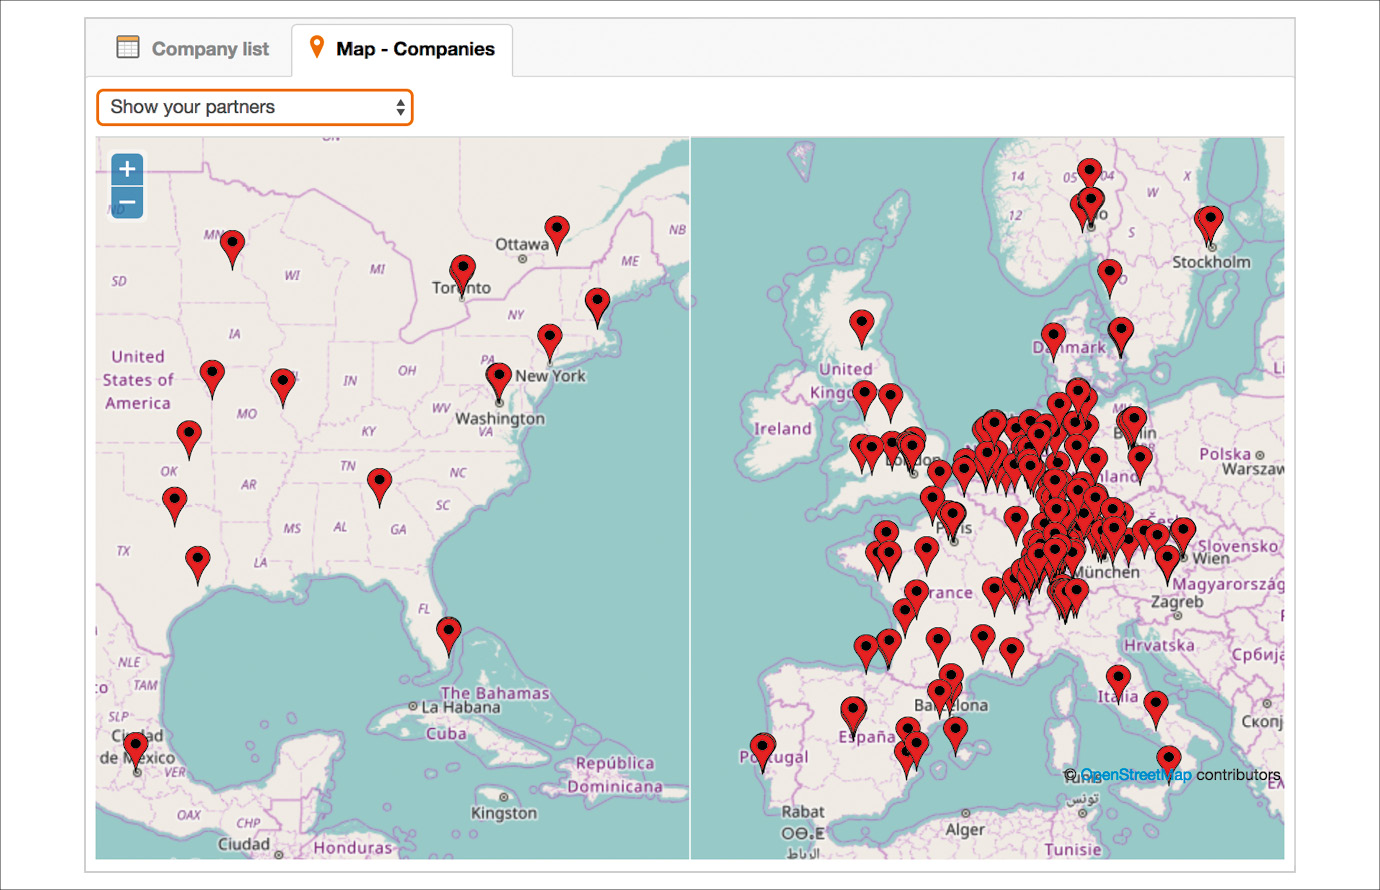 onlinereporting_networkretailers.jpg